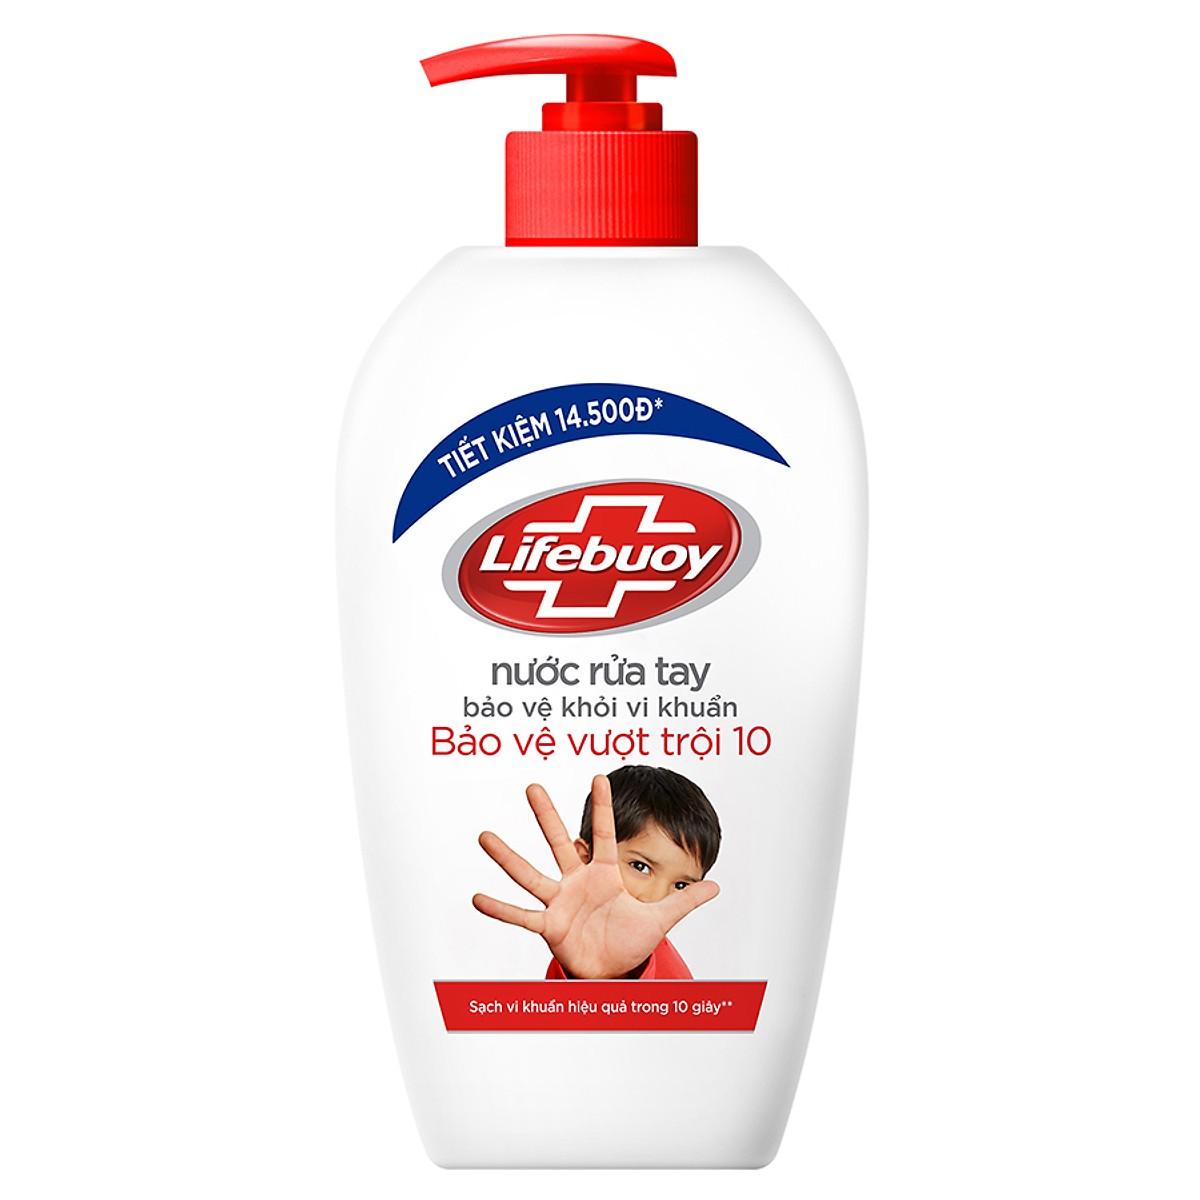 Nước rửa tay Lifebouy 500ml